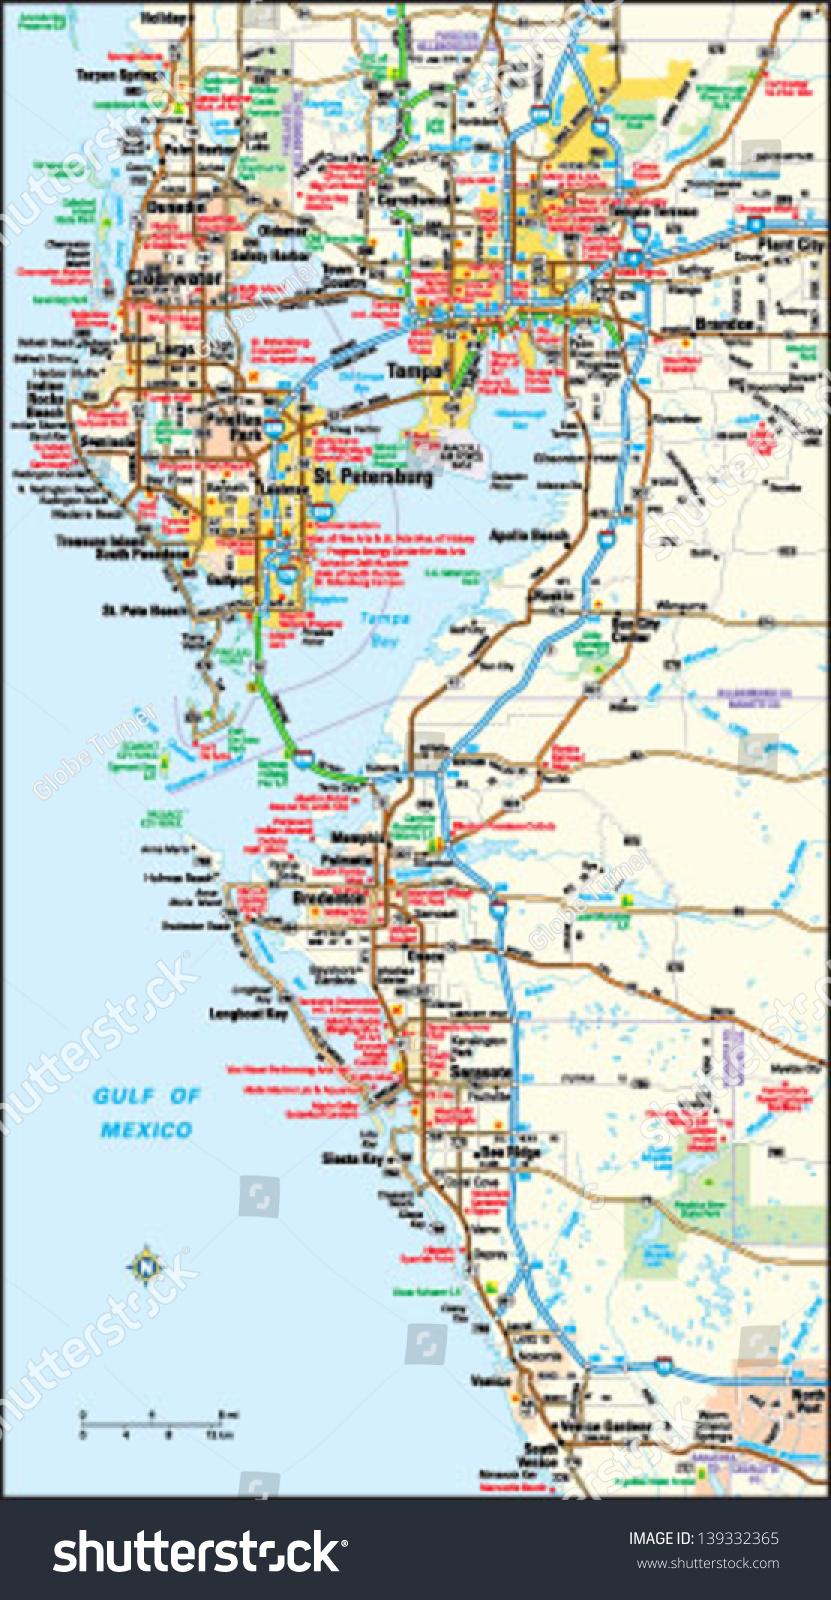 Map Tampa Florida.Tampa Florida Area Map Stock Vector Royalty Free 139332365